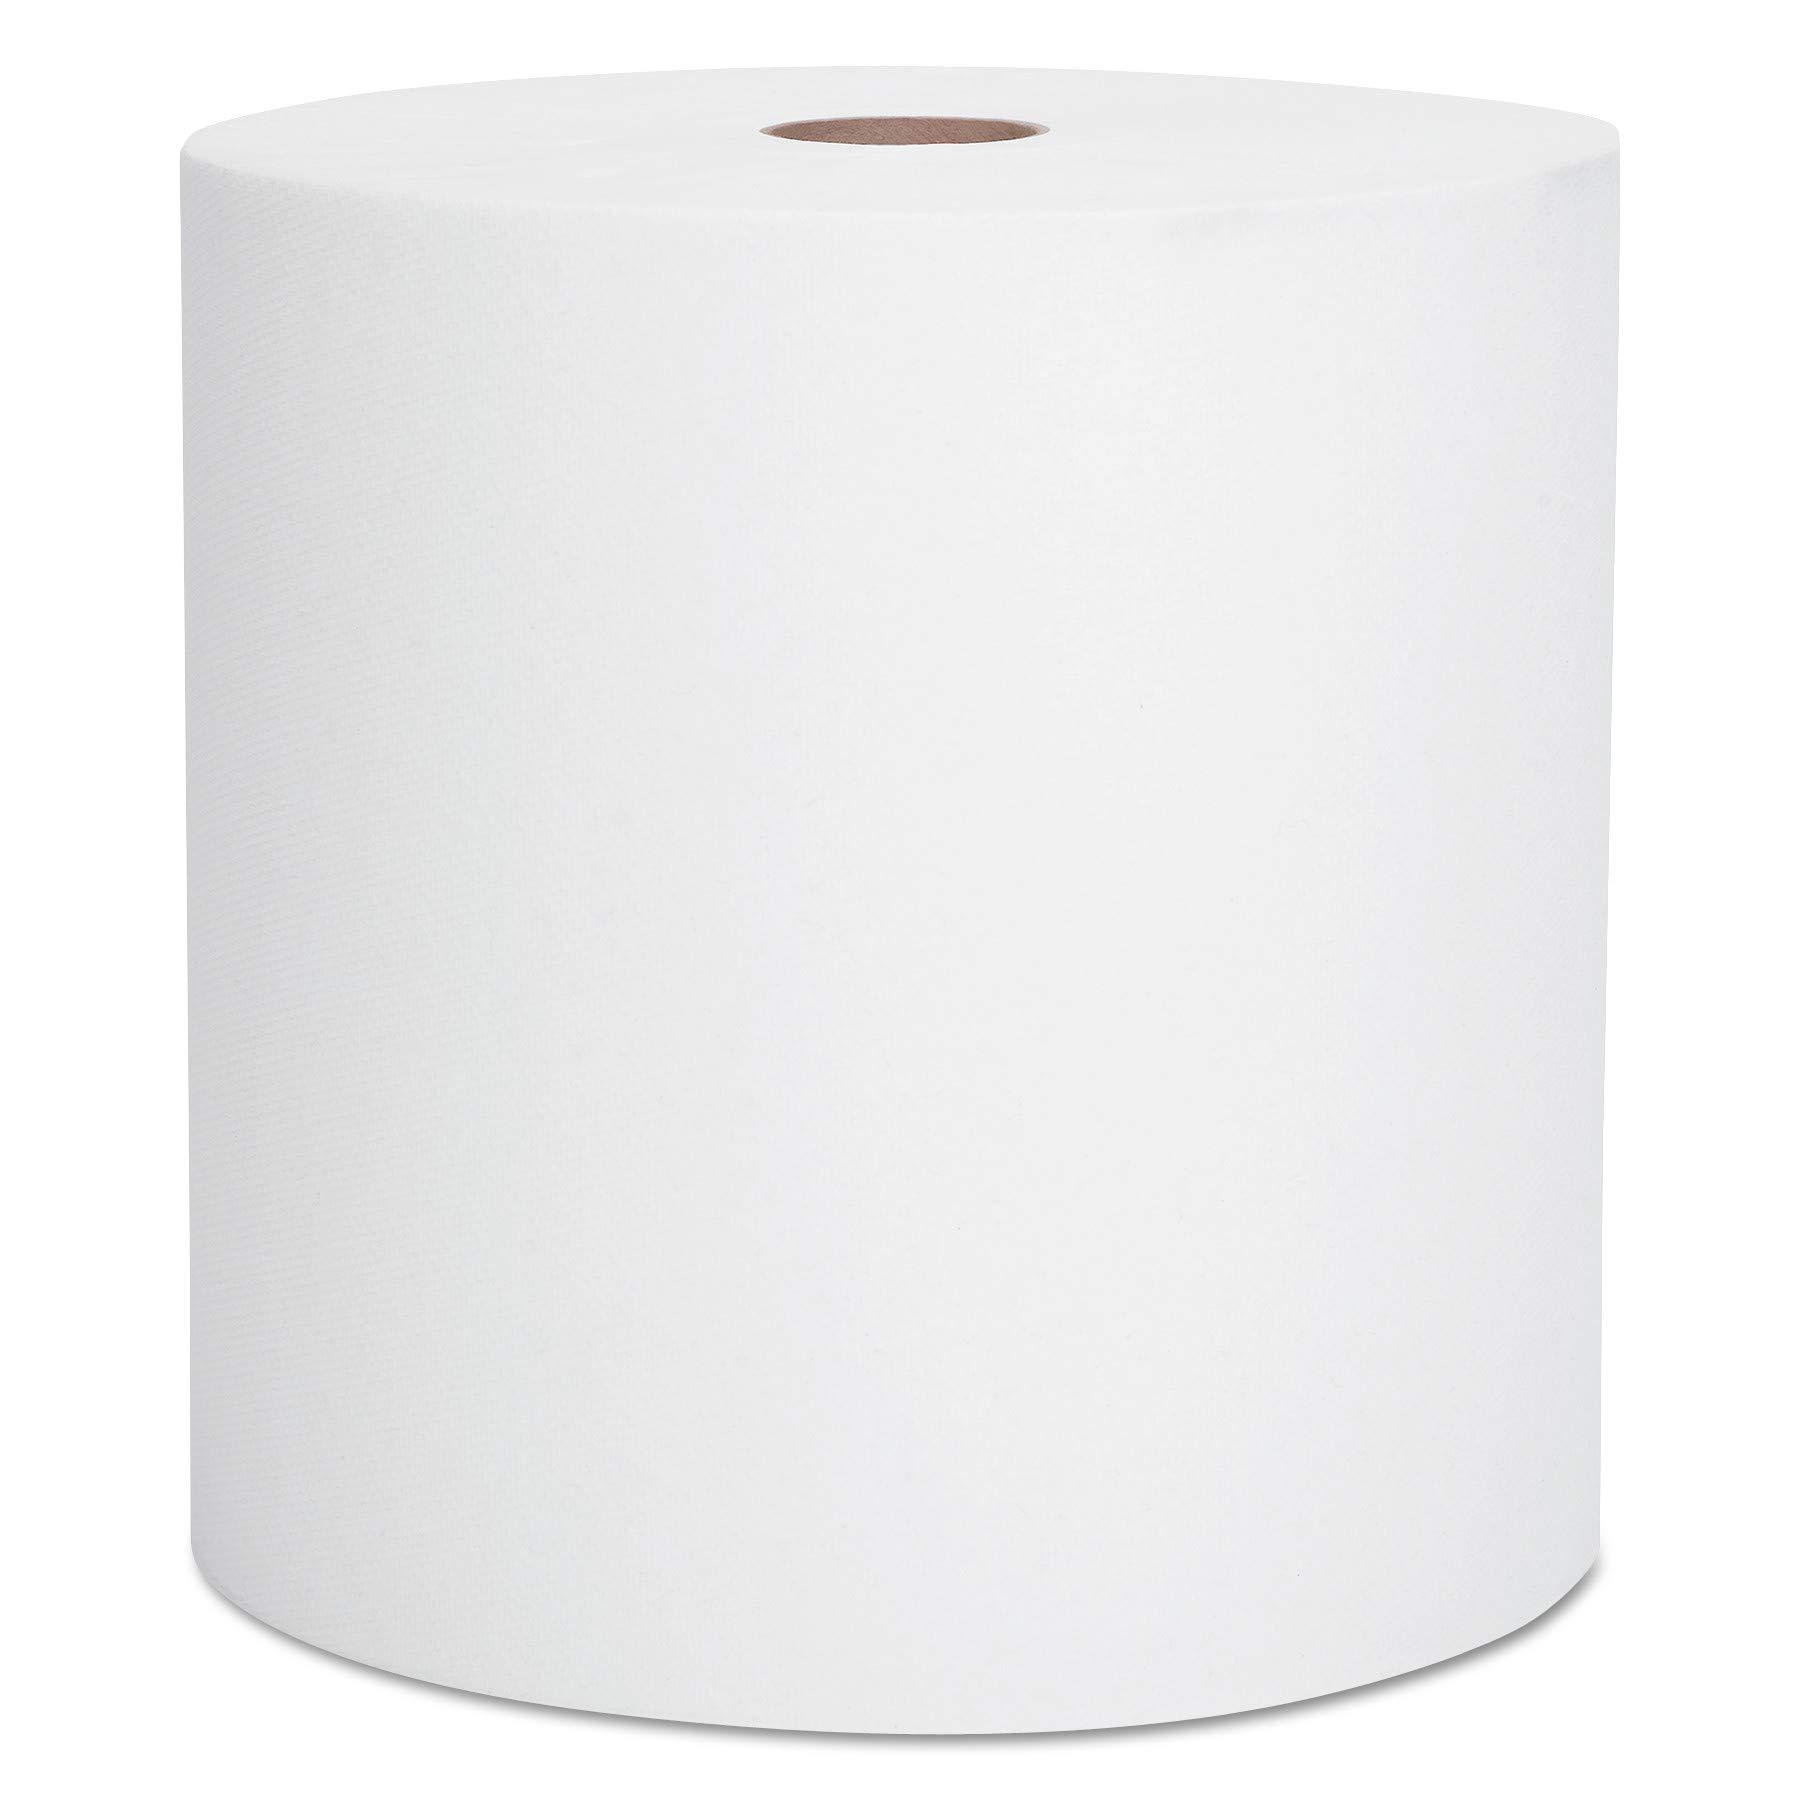 Scott 01000 Hard Roll Towels, 1.5'' Core, 8 x 1000ft, White (Case of 12 Rolls)